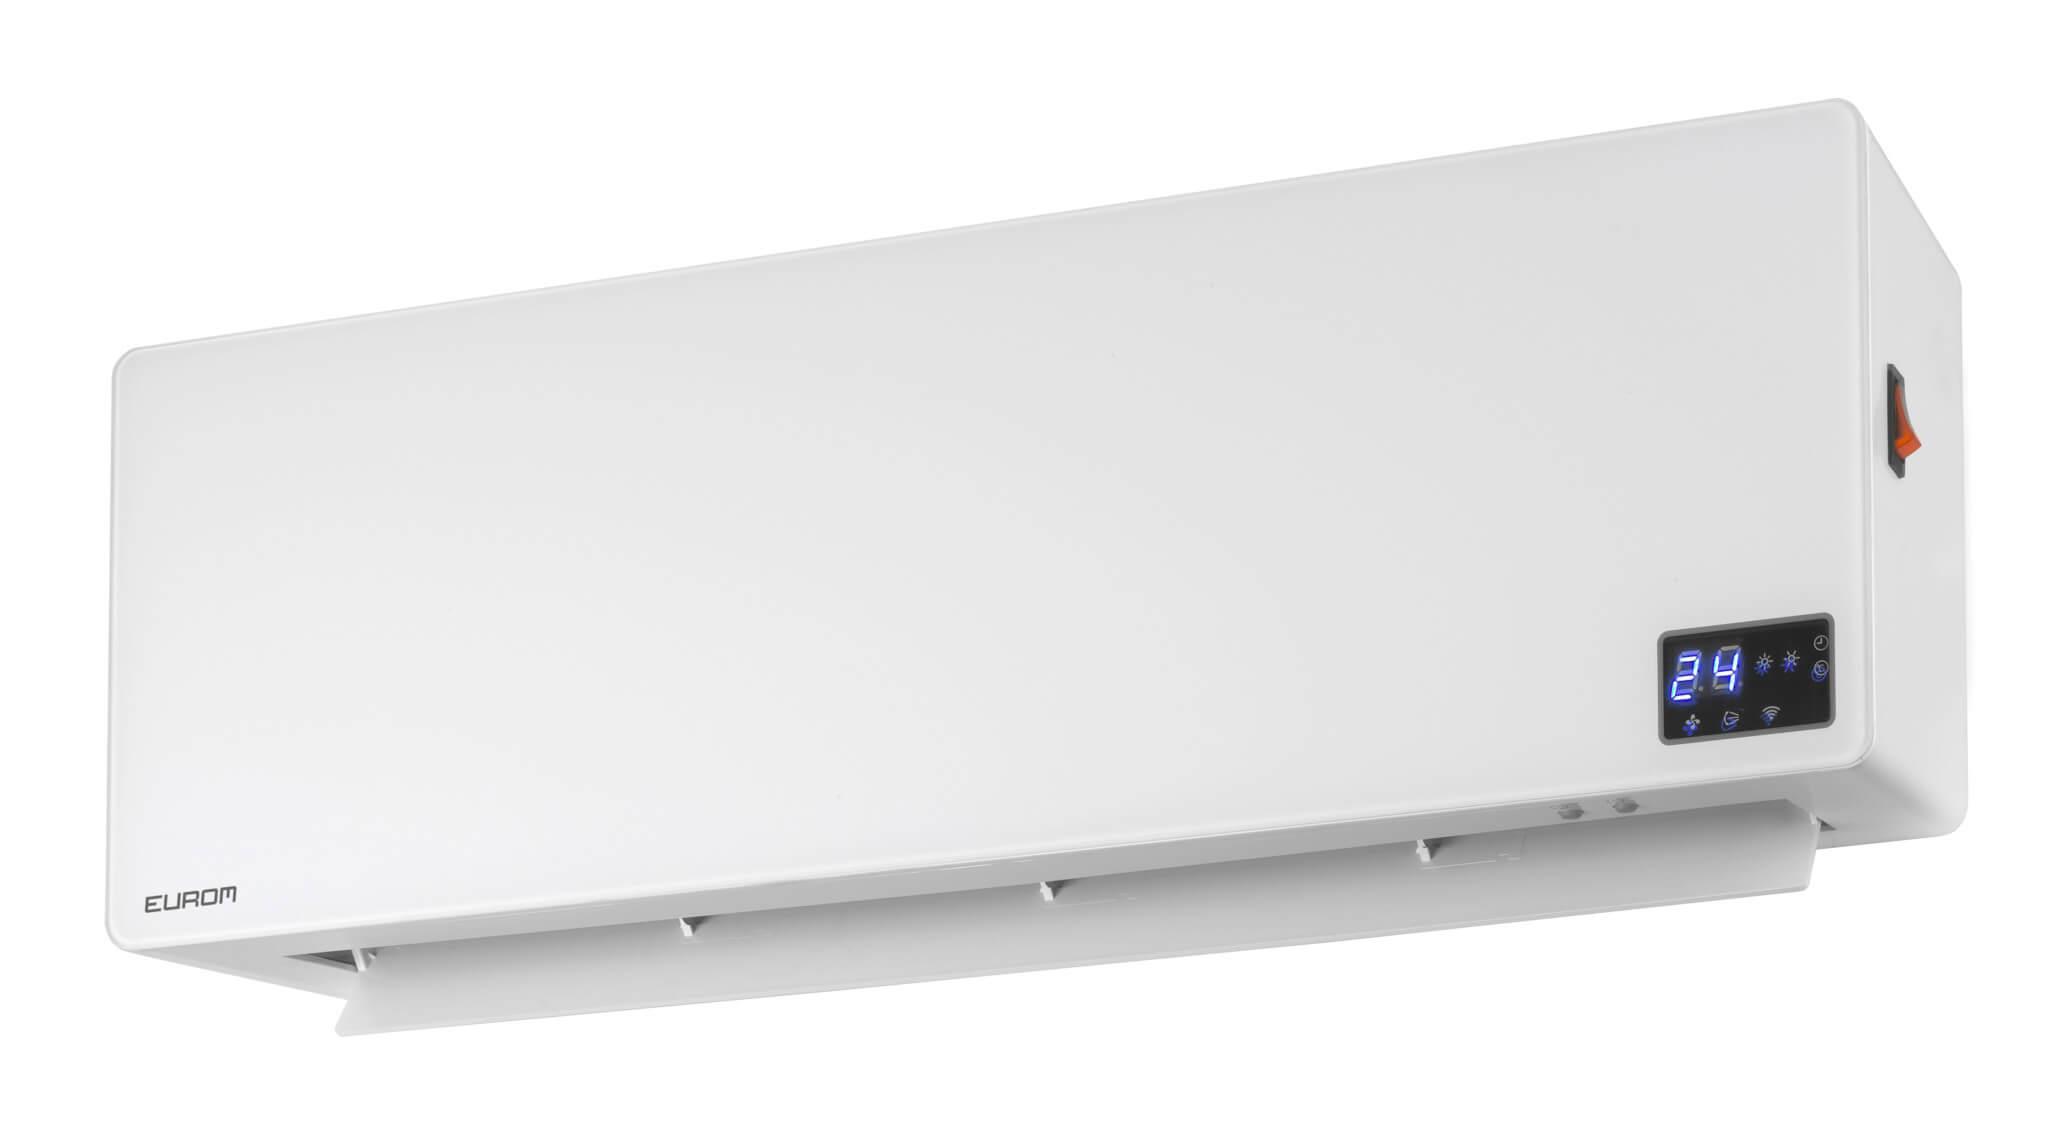 Eurom Wall Designheat 2000 WiFi Elektrische verwarming 2000W   Met afstandsbediening en WiFi